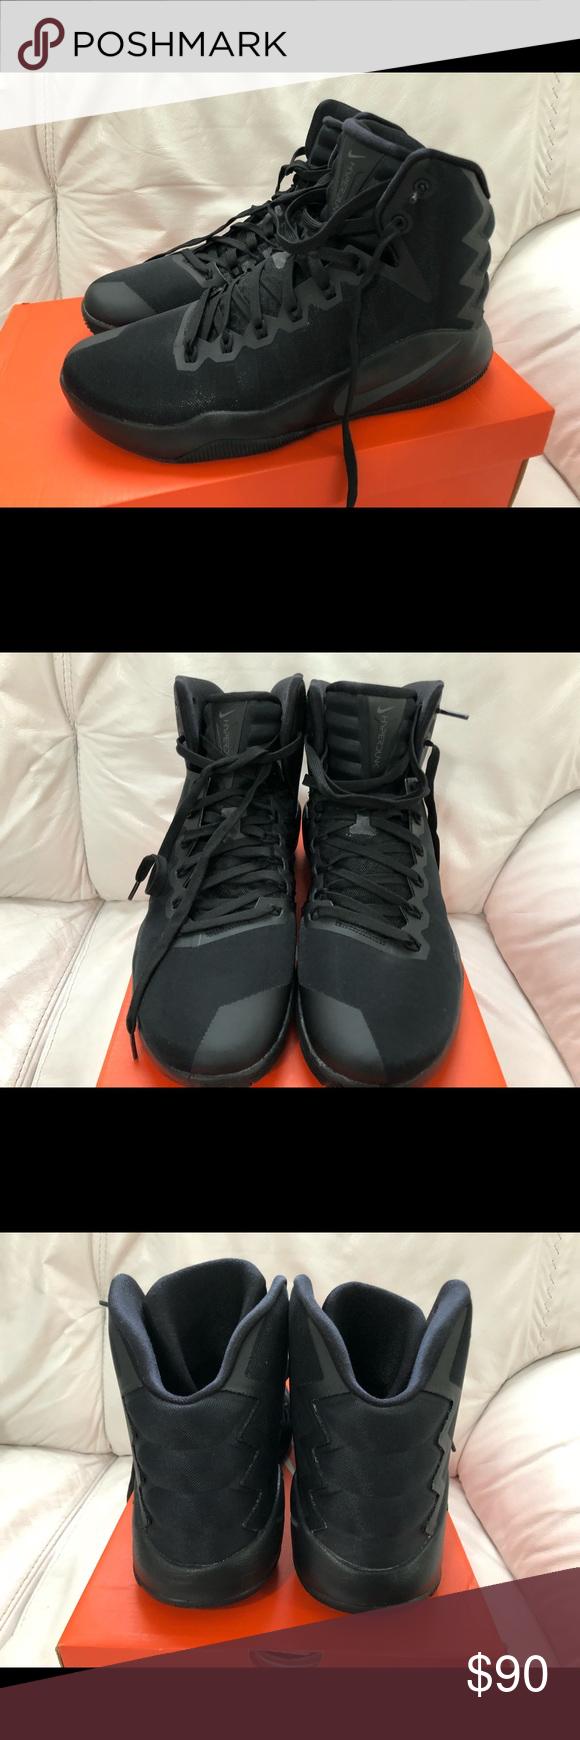 6373b272ab68 Nike Hyperdunk 2016 Black Men s Size 9.5 New Nike Hyperdunk 2016 Black    Anthracite - Volt Men s Size 9.5 New w  Box. Retail Price is  140. Nike  Shoes ...